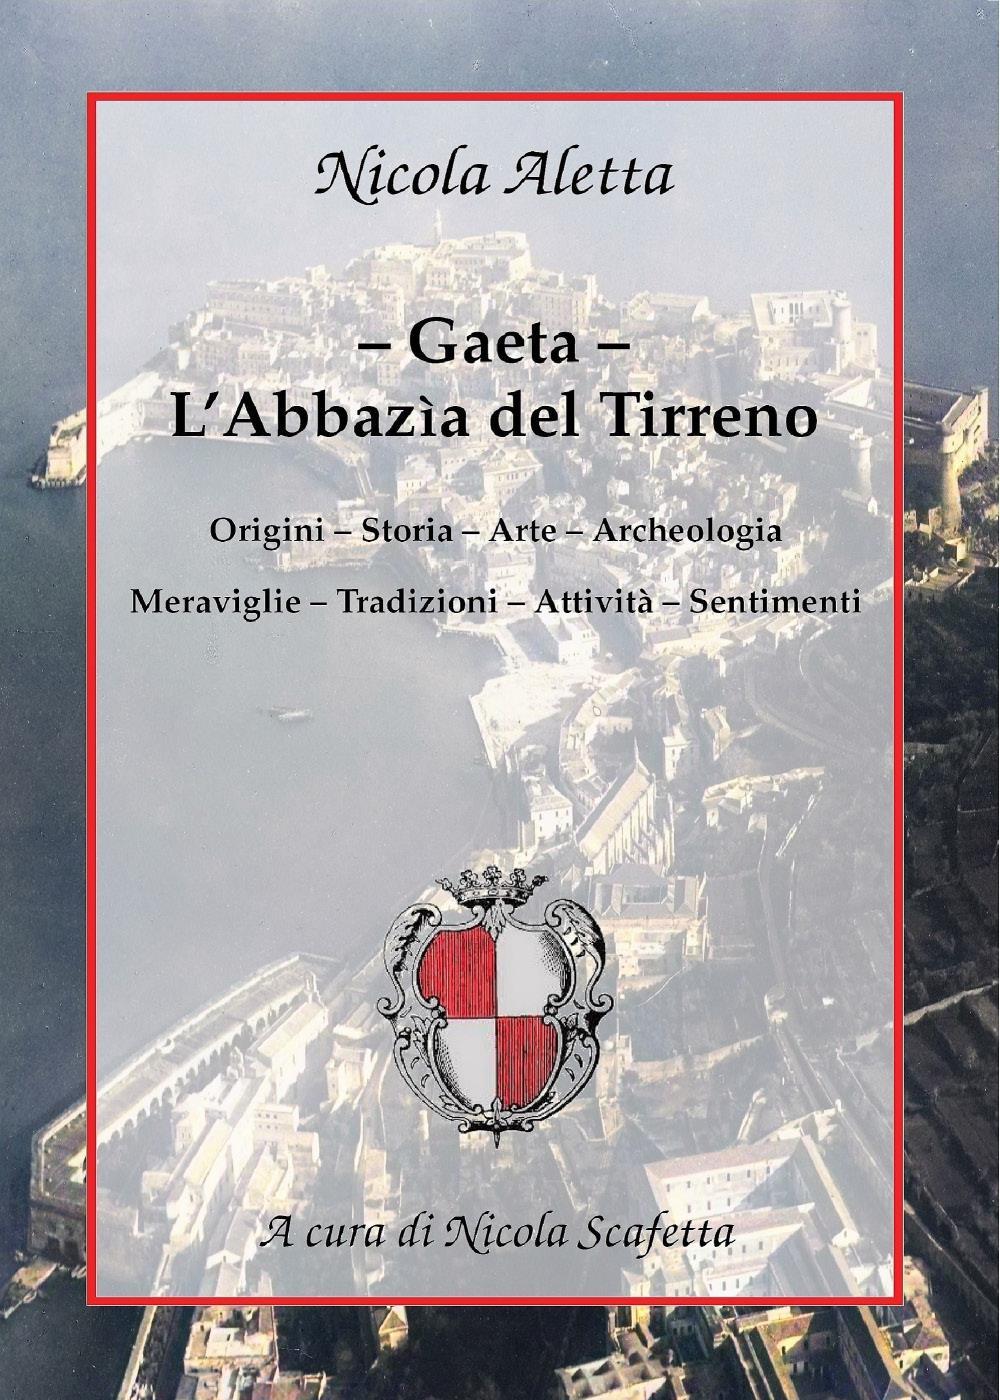 Gaeta: l'Abbazìa del Tirreno